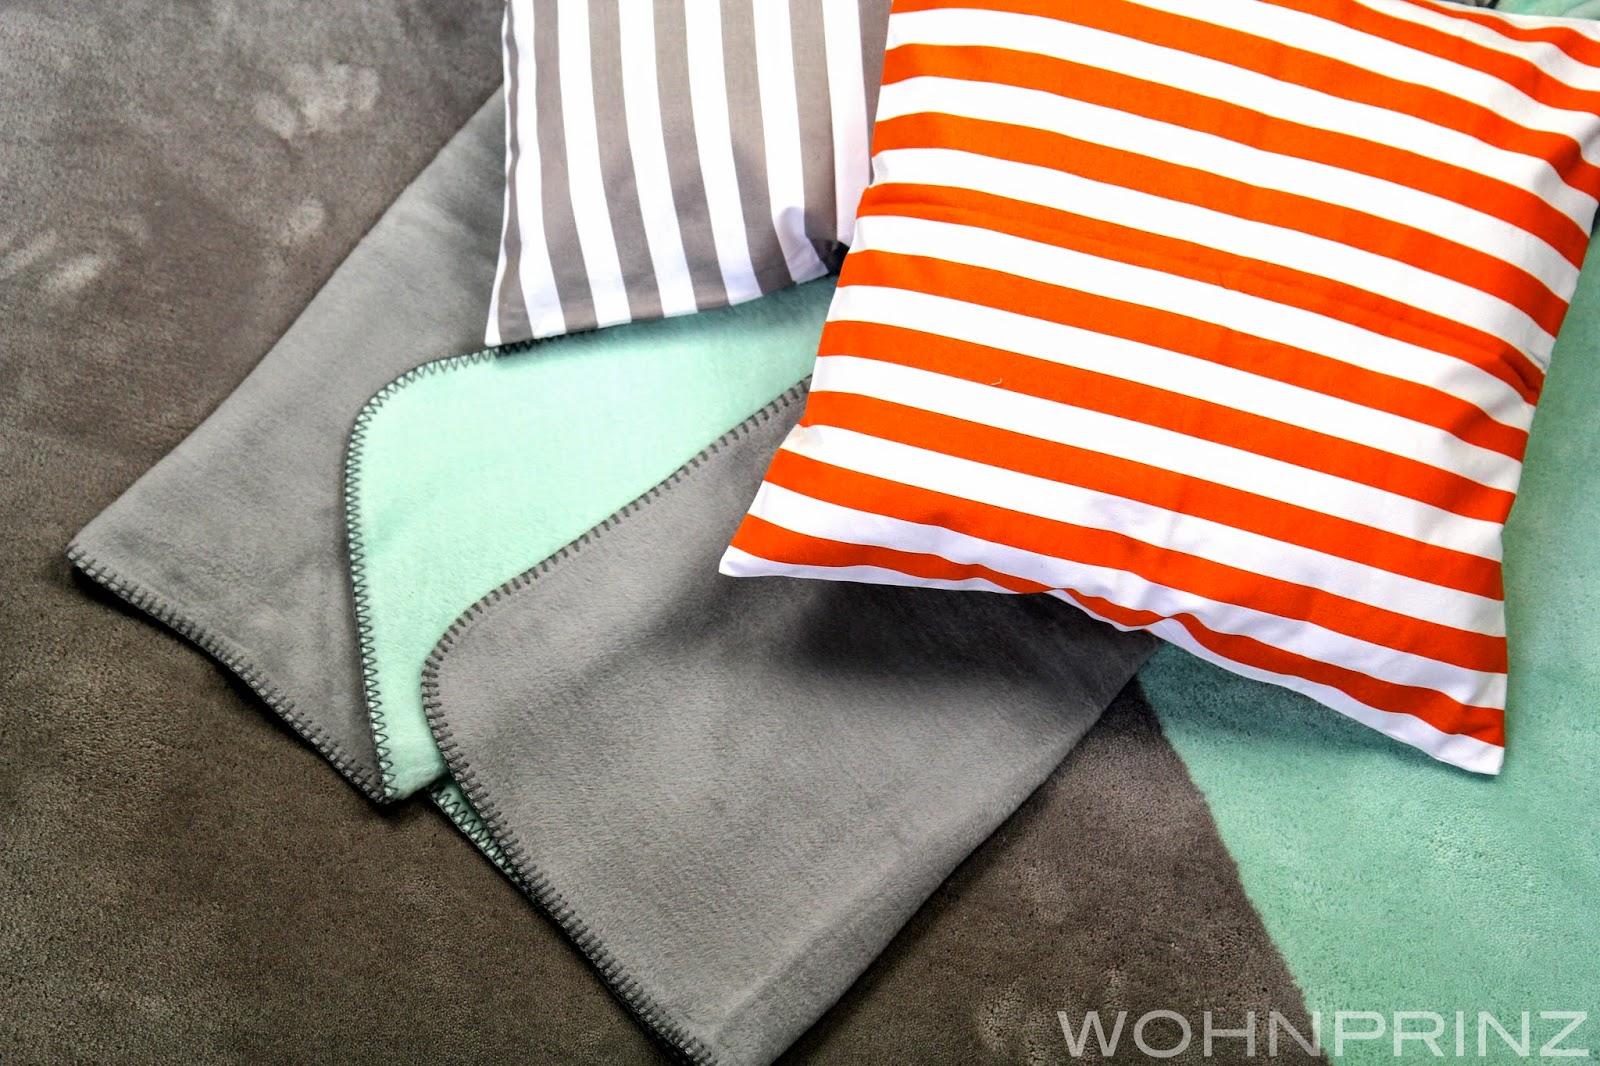 bastian der wohnprinz wohnblogger im videoformat mai 2014. Black Bedroom Furniture Sets. Home Design Ideas